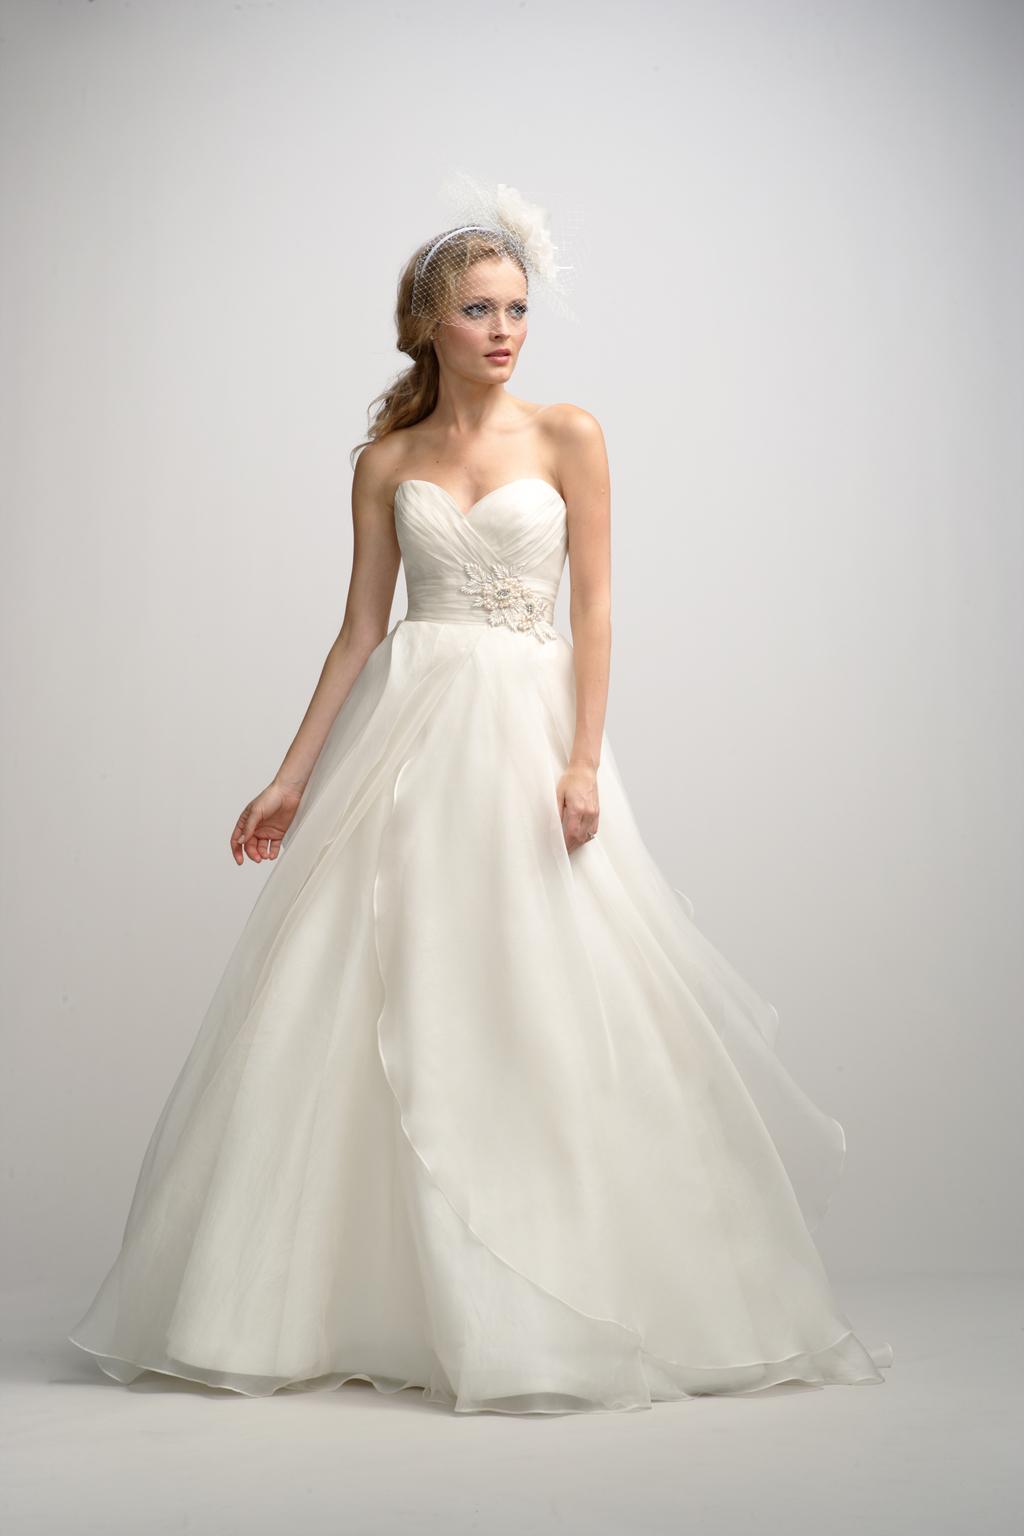 Fall-2012-wedding-dress-watters-bridal-gown-9.original.full